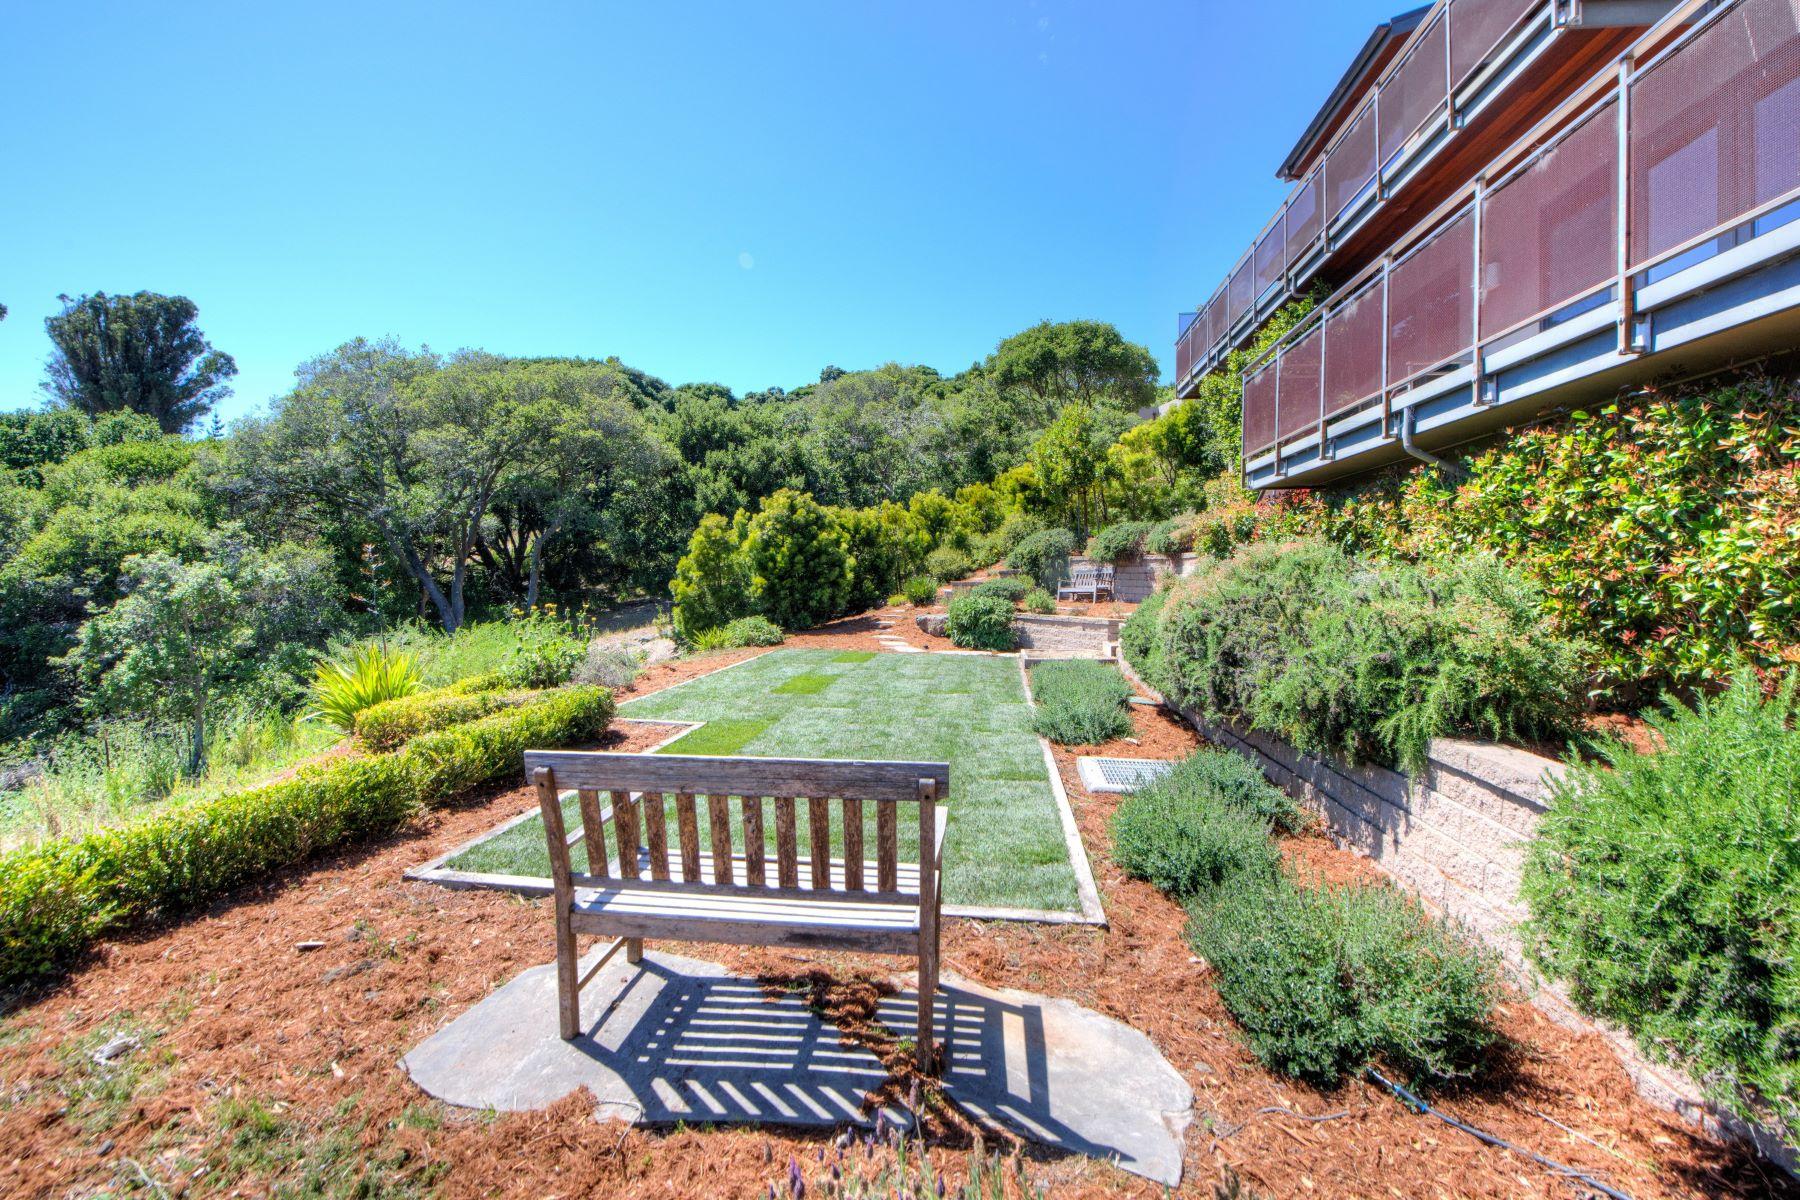 獨棟家庭住宅 為 出售 在 Architectural Masterpiece 81 Round Hill Road Tiburon, 加利福尼亞州, 94920 美國